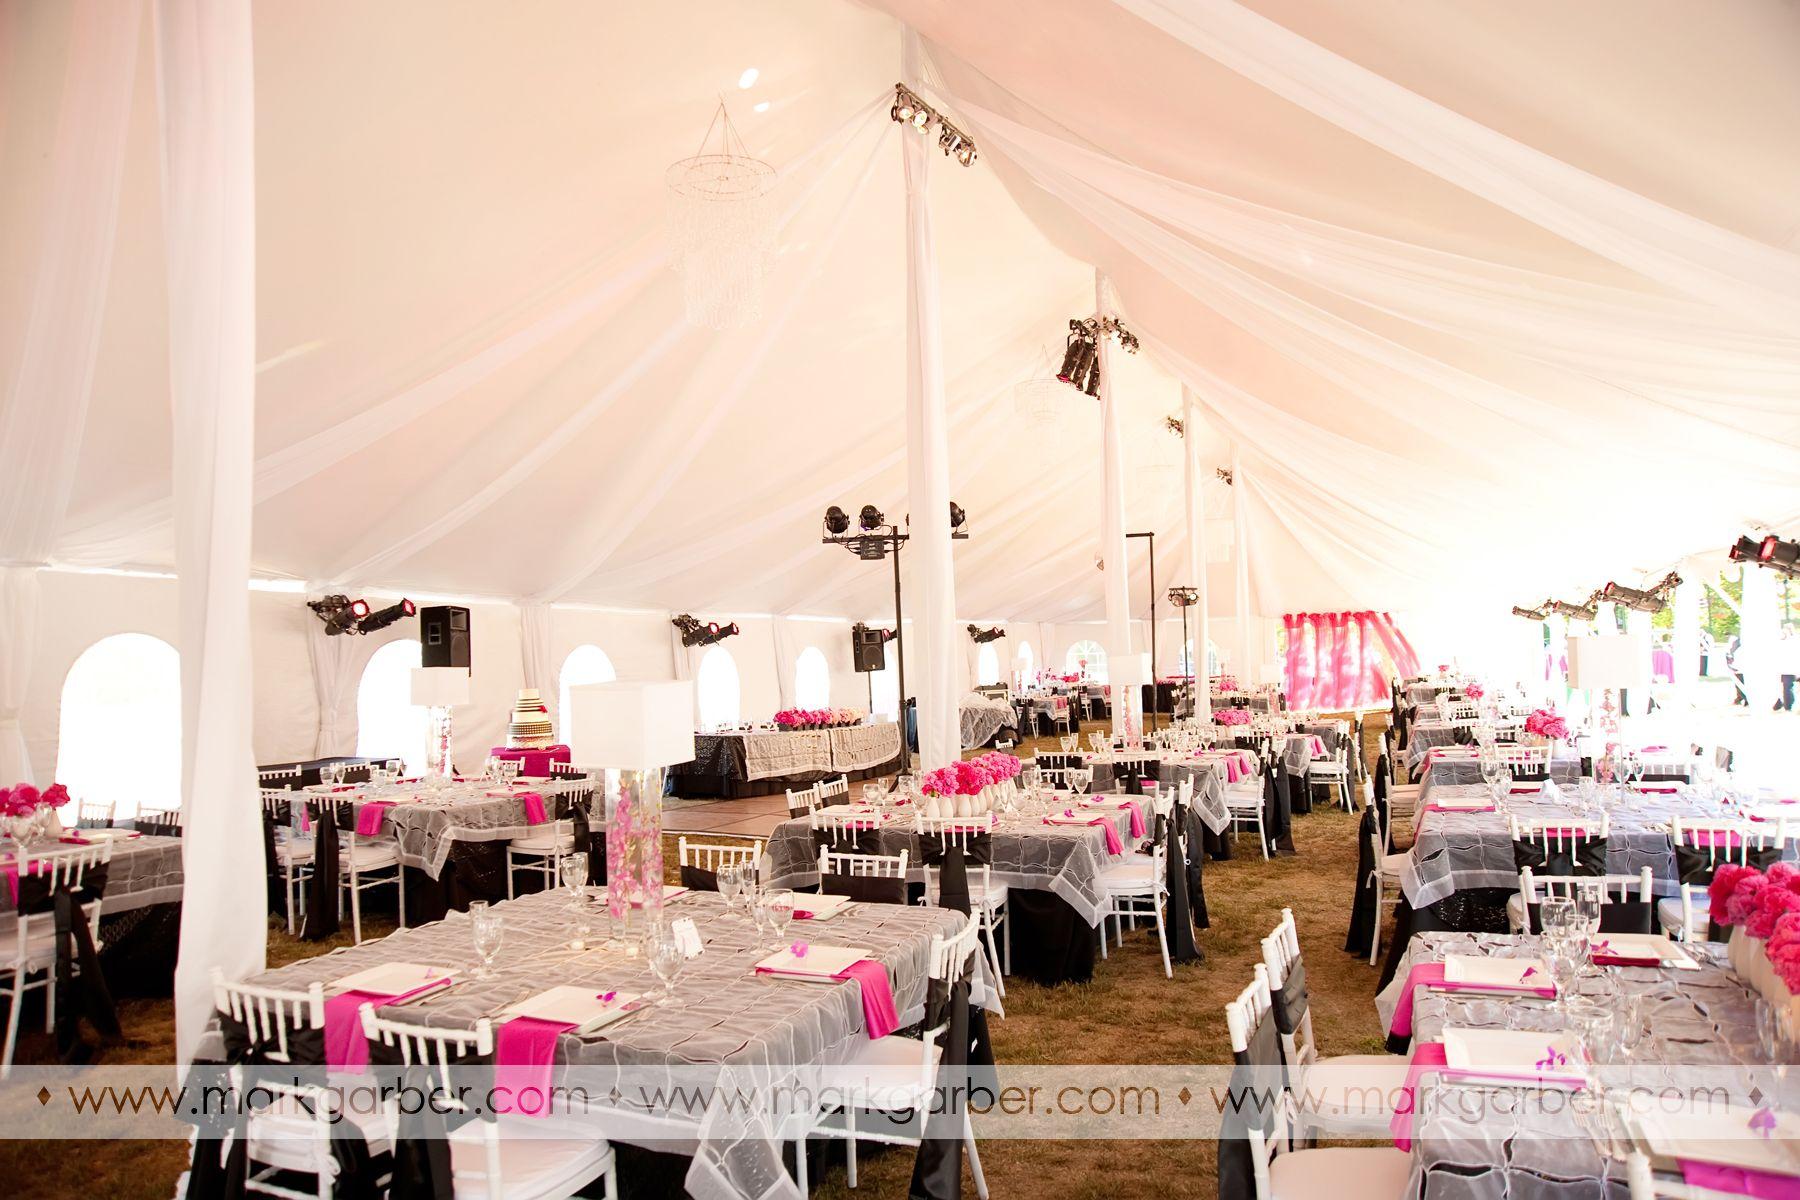 Tent From Prime Time Party Rental Dayton Cincinnati Weddings Events Tents Tentrental Primetime Modern Wedding Reception Wedding Modern Wedding Reception